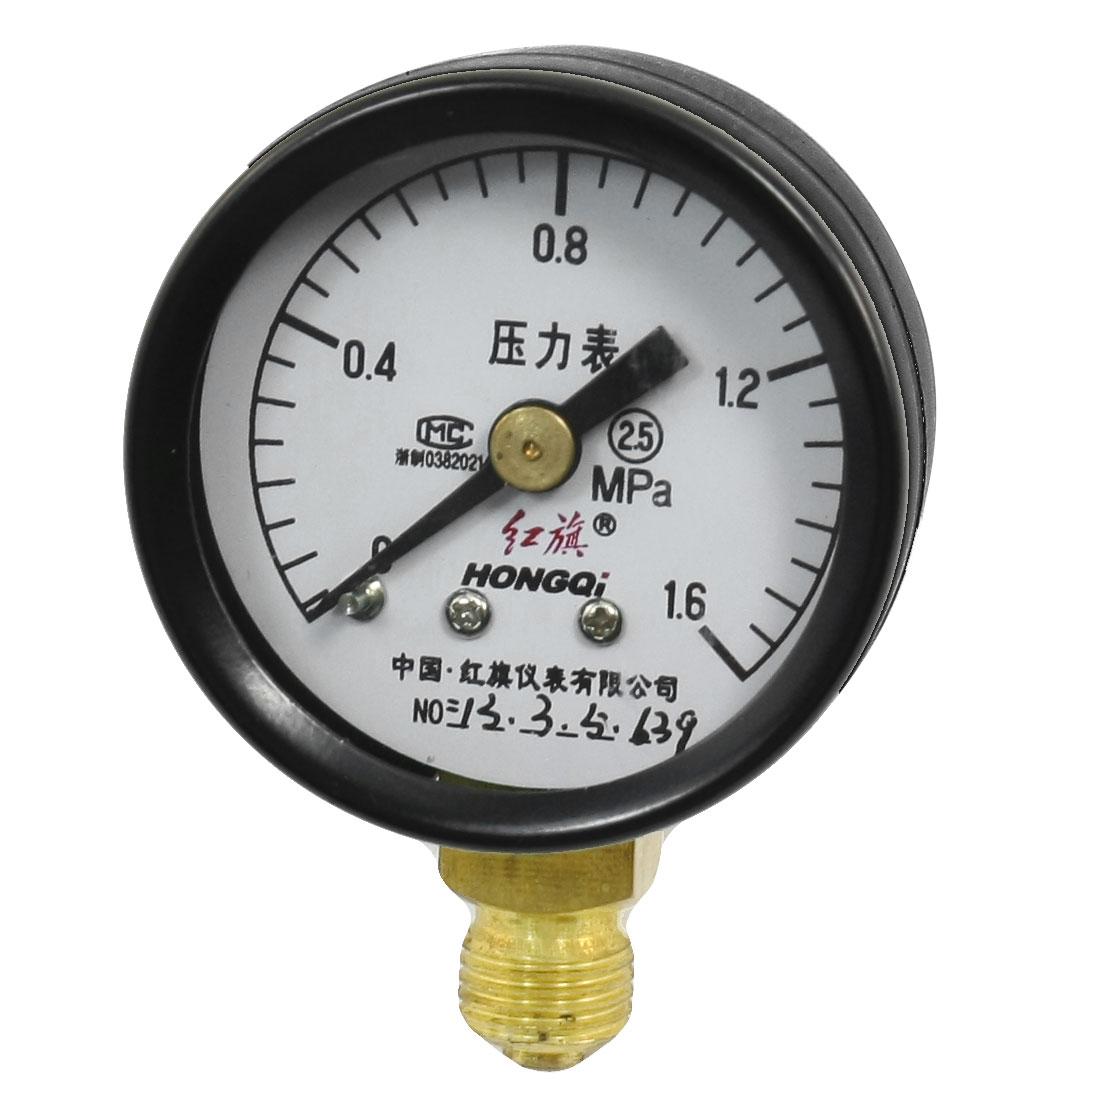 Horizontal Mount 10mm Male Thread Water Air Pressure Gauge 0-1.6Mpa